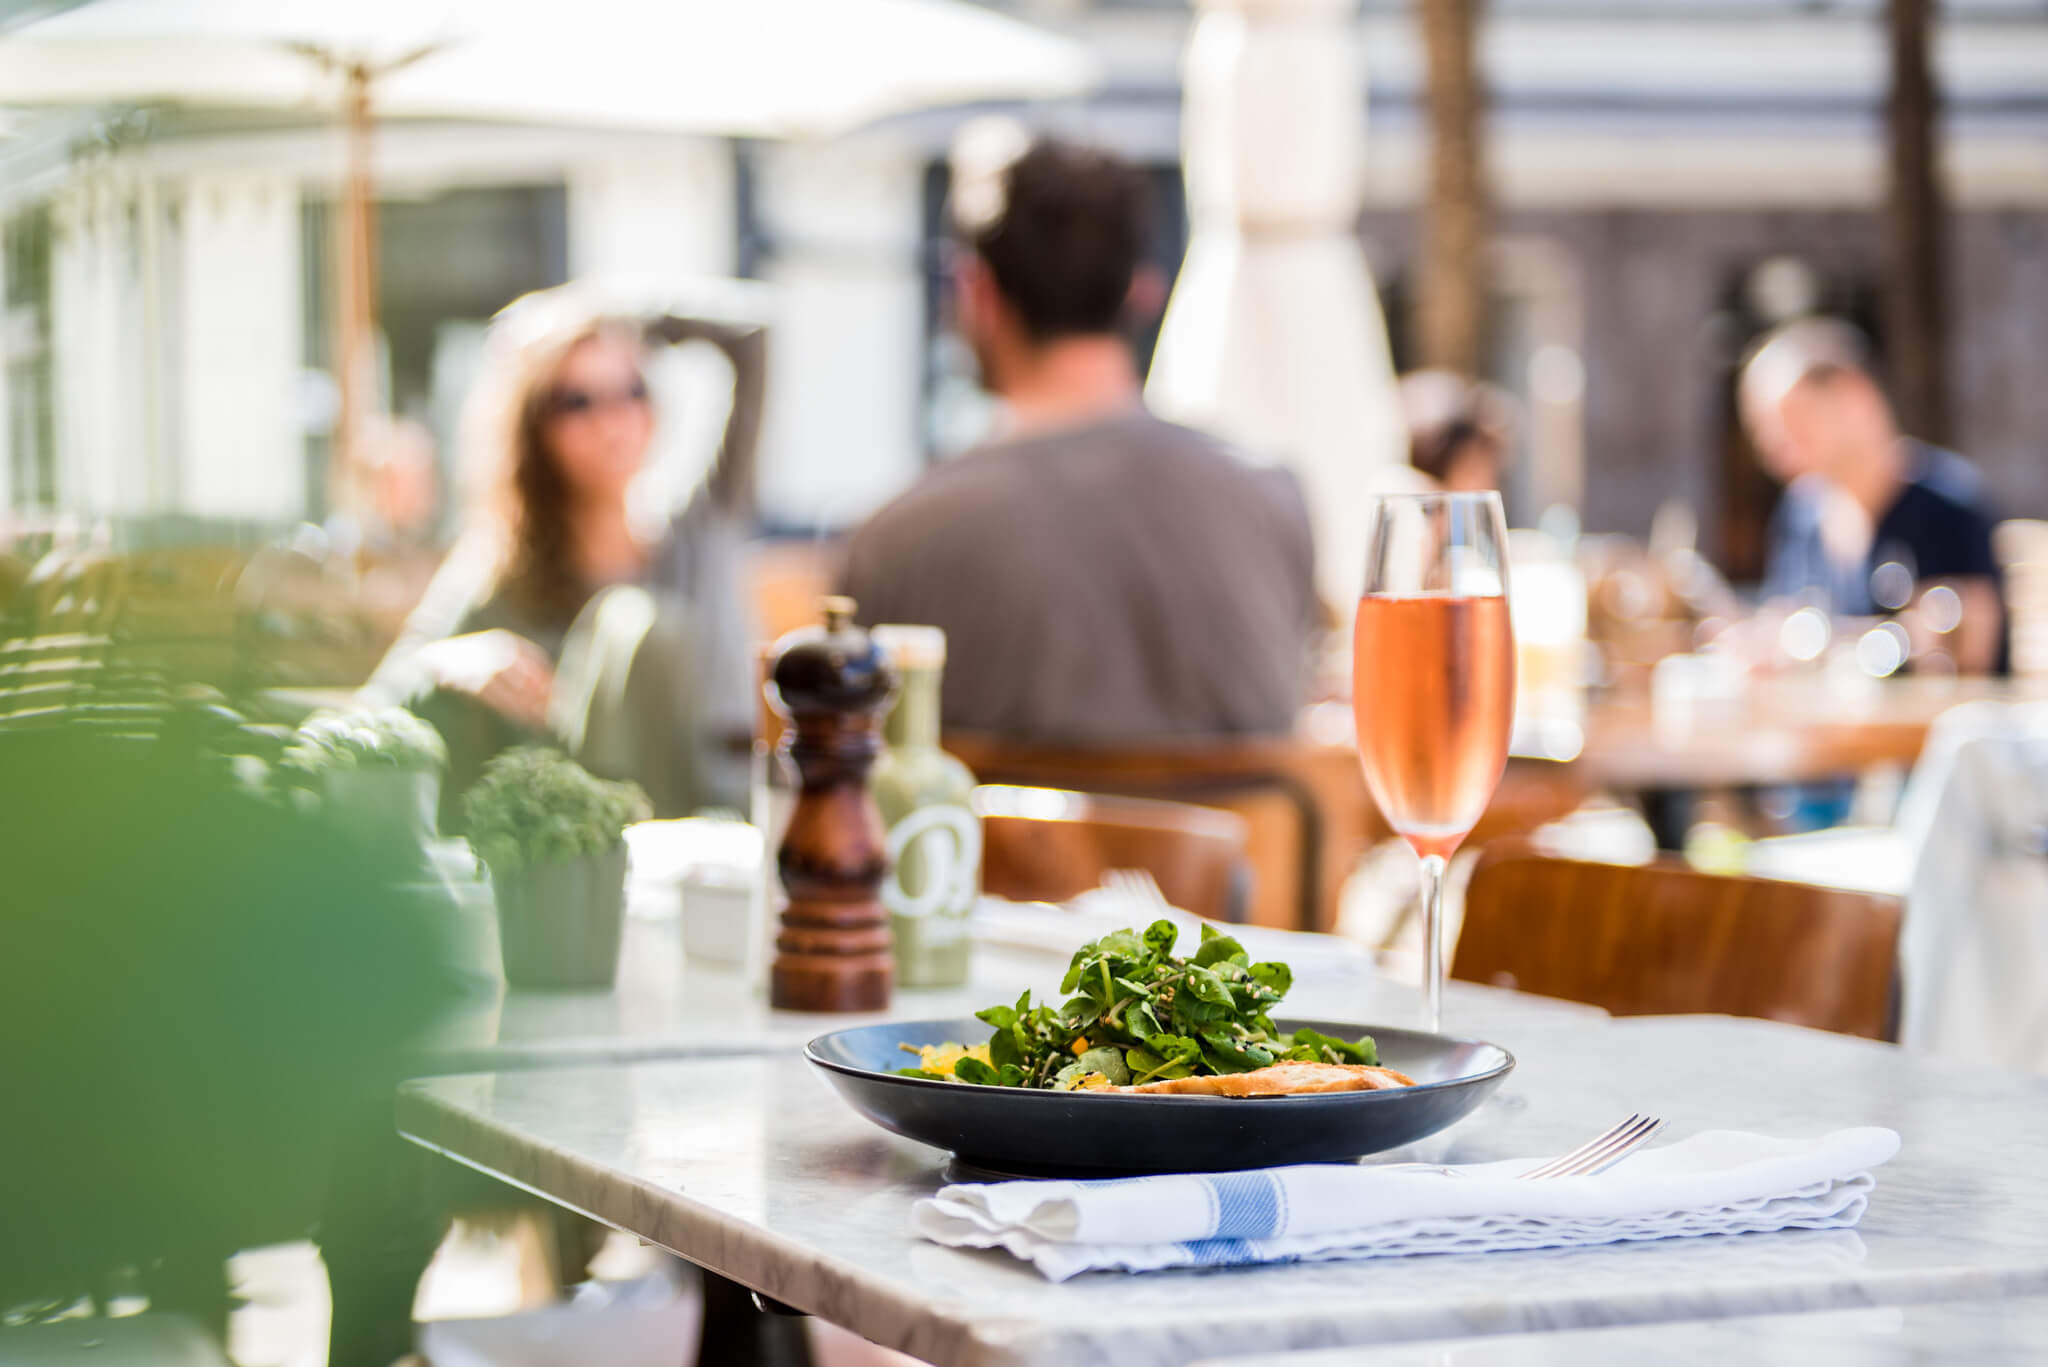 https://www.white-ibiza.com/wp-content/uploads/2020/03/white-ibiza-restaurants-locals-only-2020-05.jpg